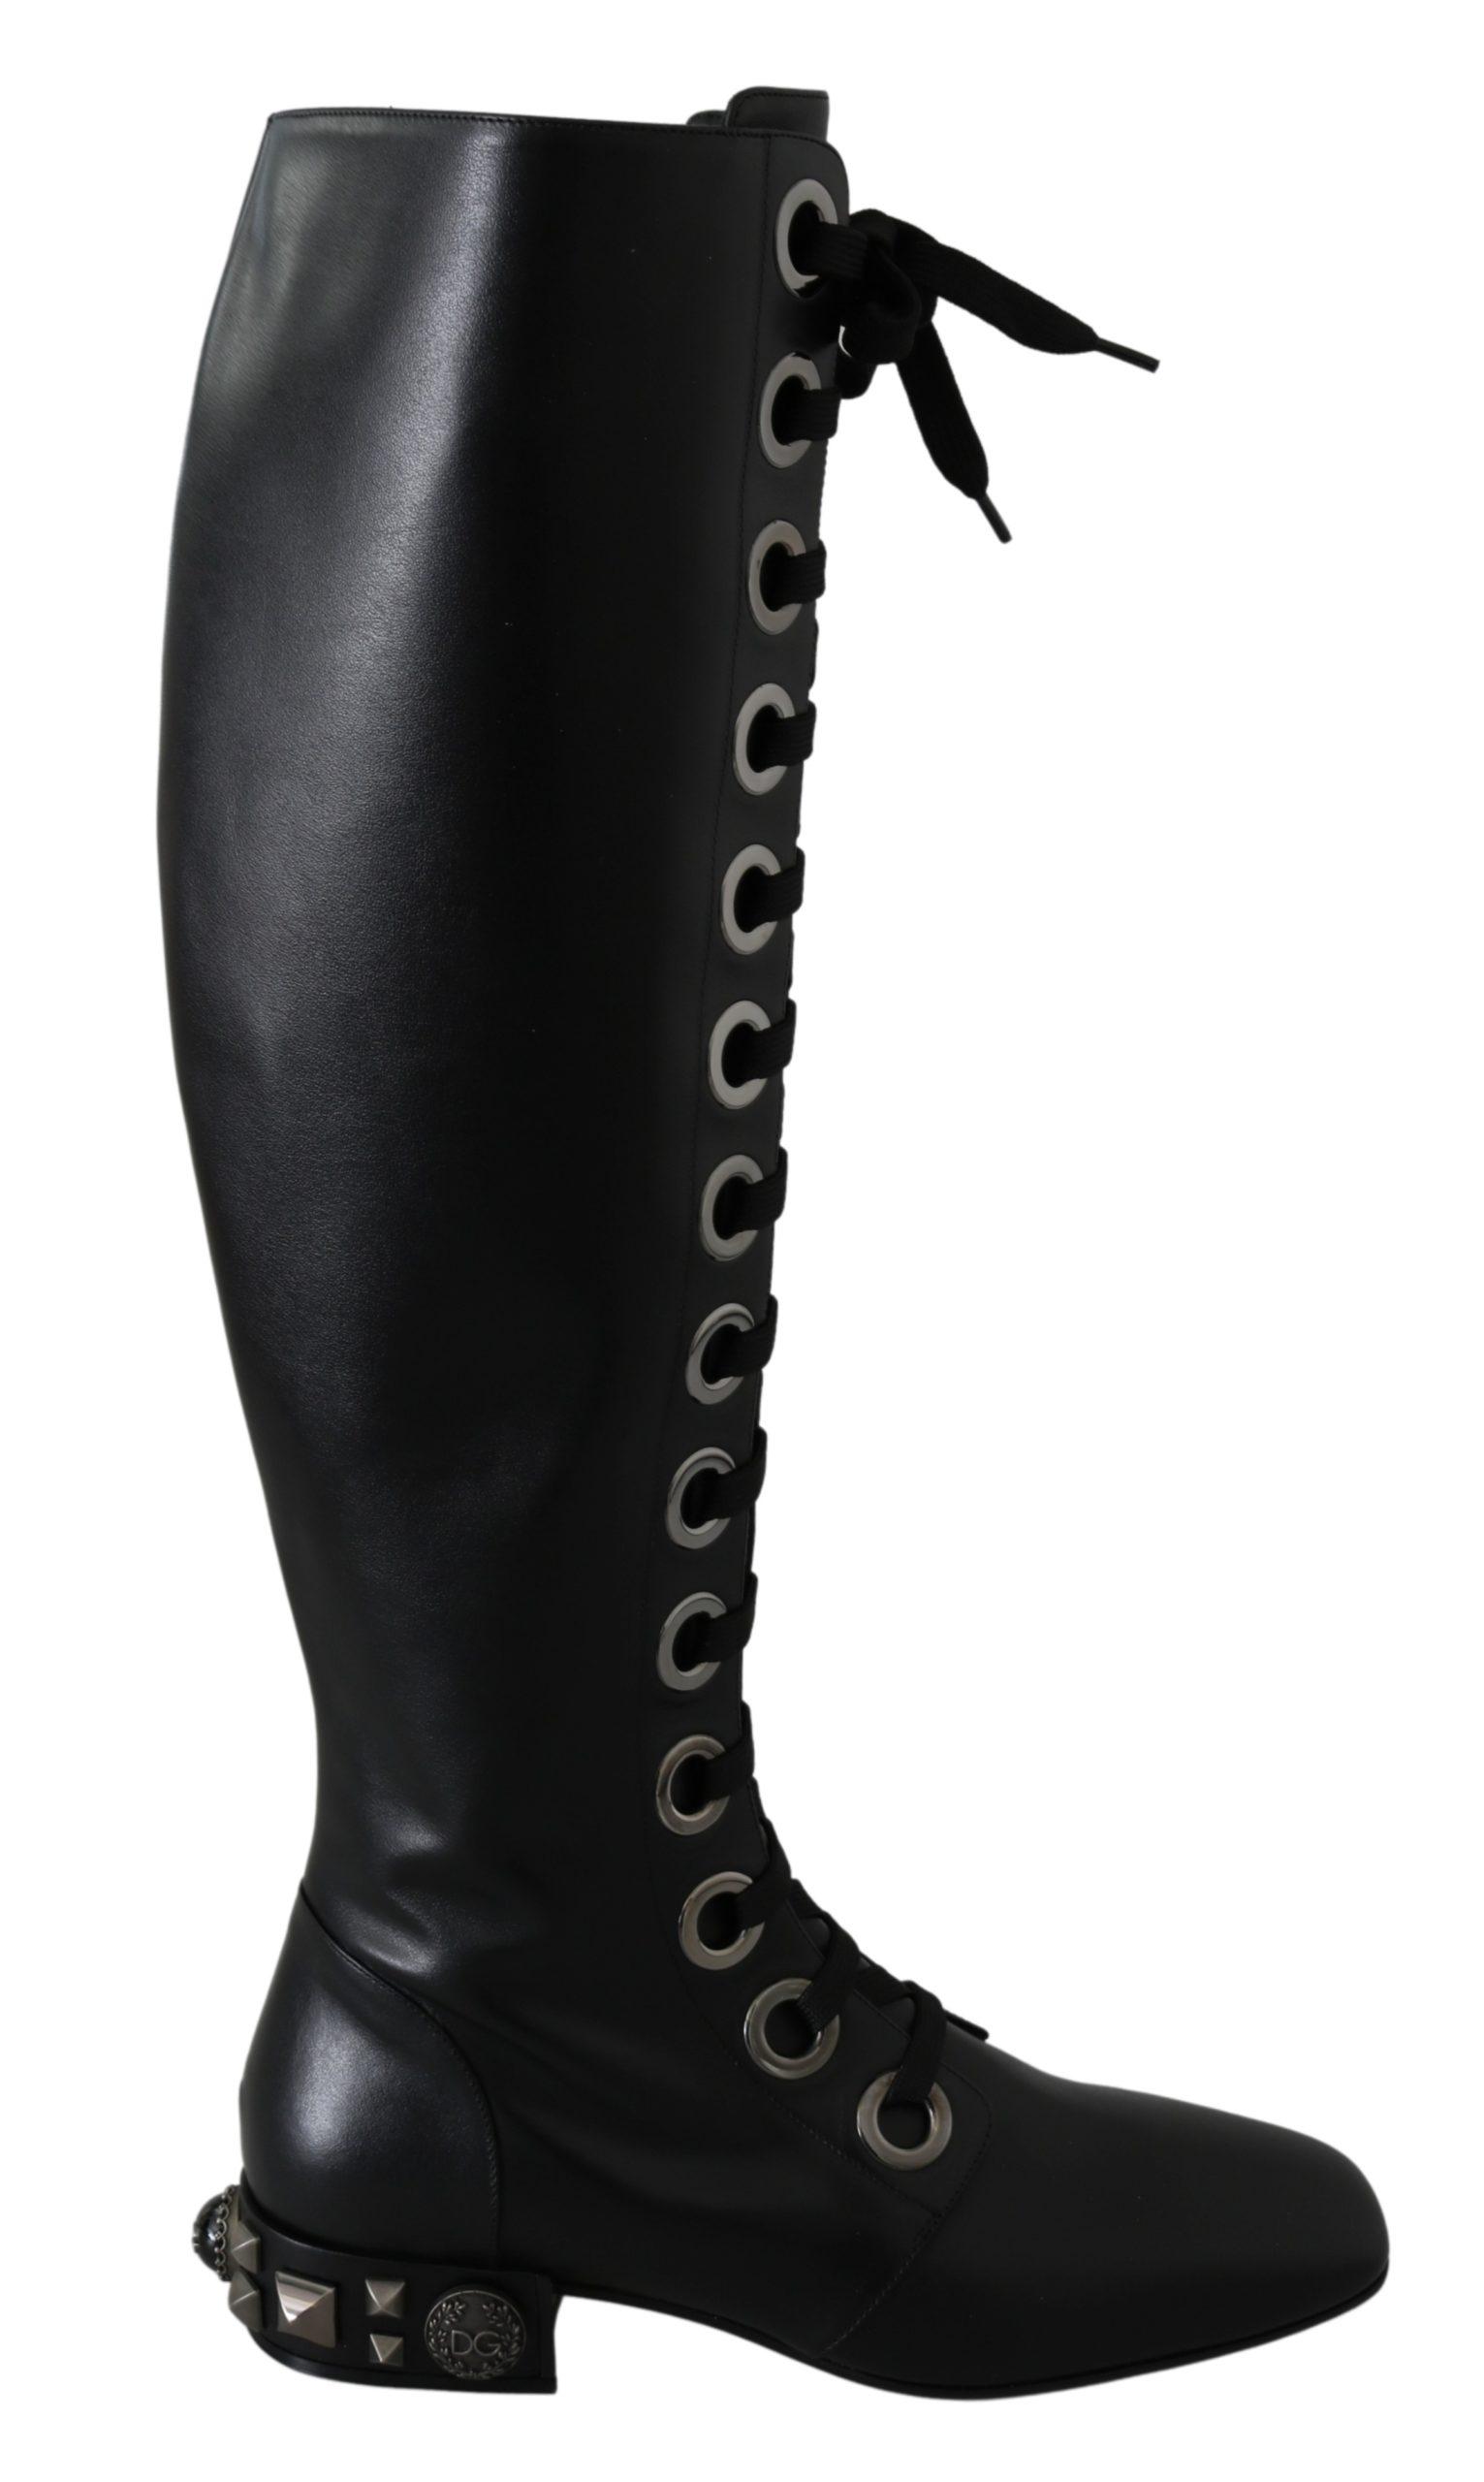 Black Leather Knee Biker Studs Boots Shoes - EU37/US6.5